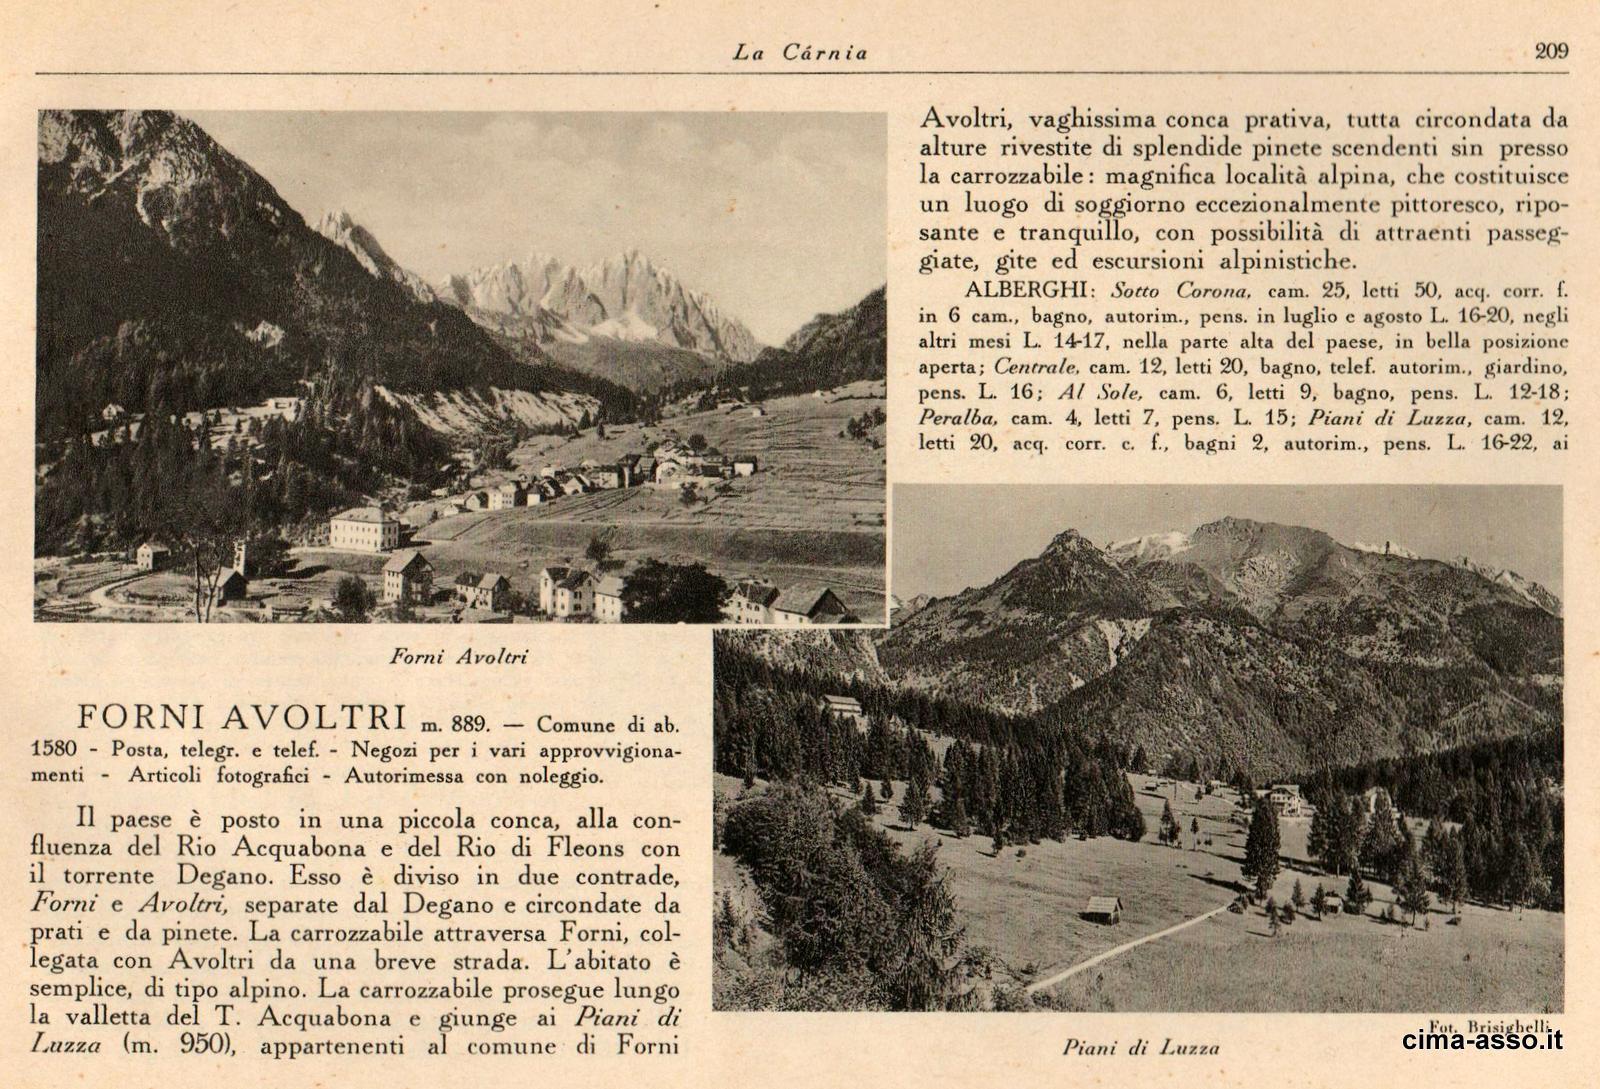 TCI-1935: Forni Avoltri